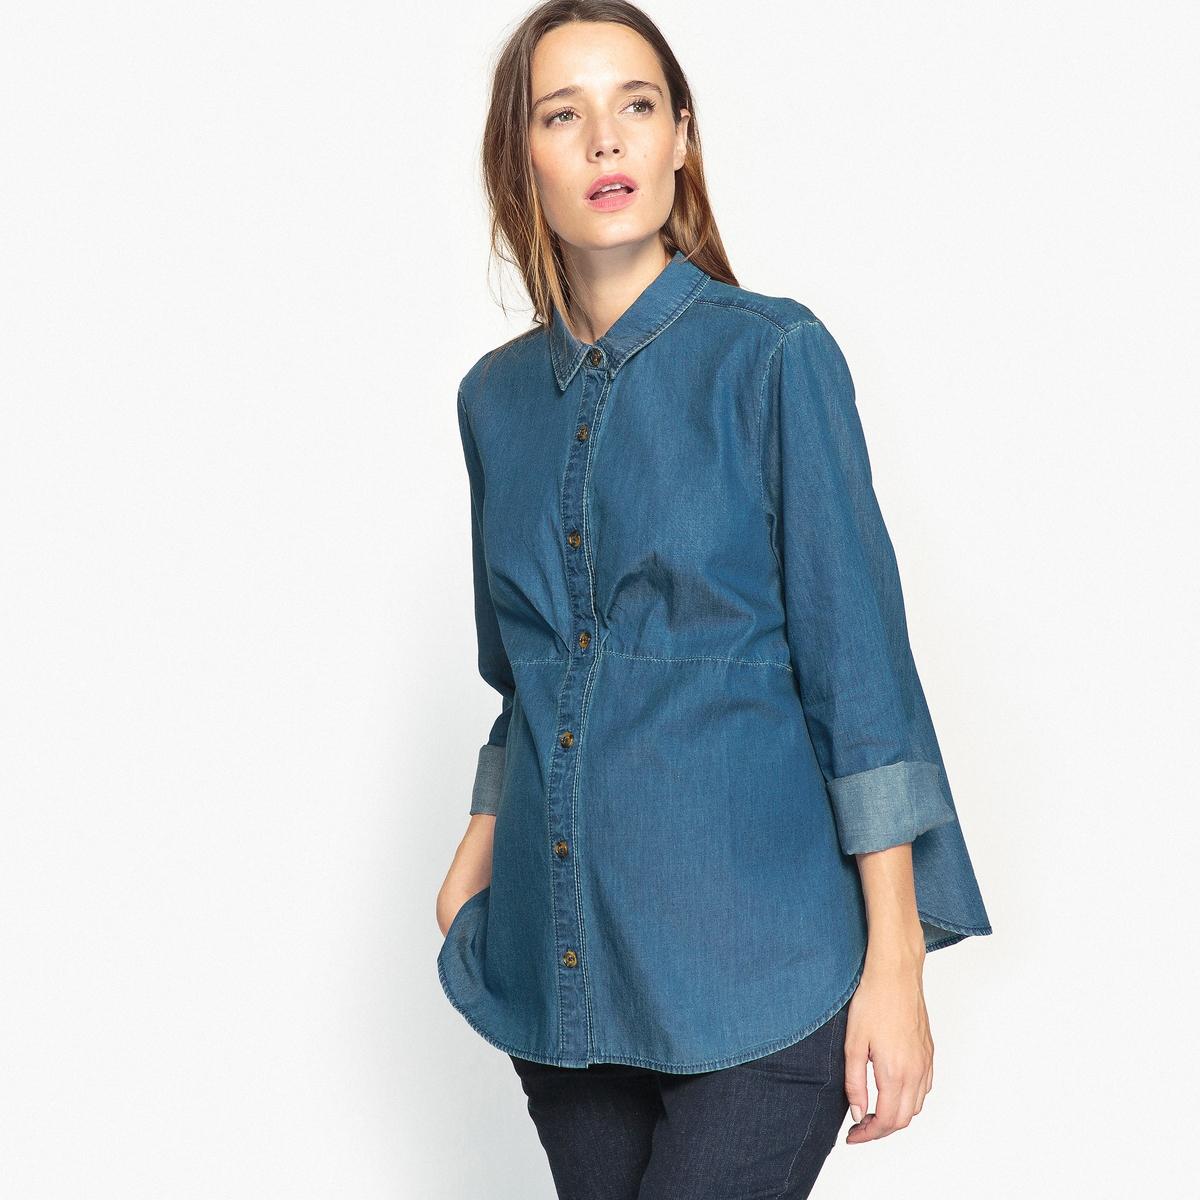 Рубашка из денима для периода беременности от LA REDOUTE MATERNITE